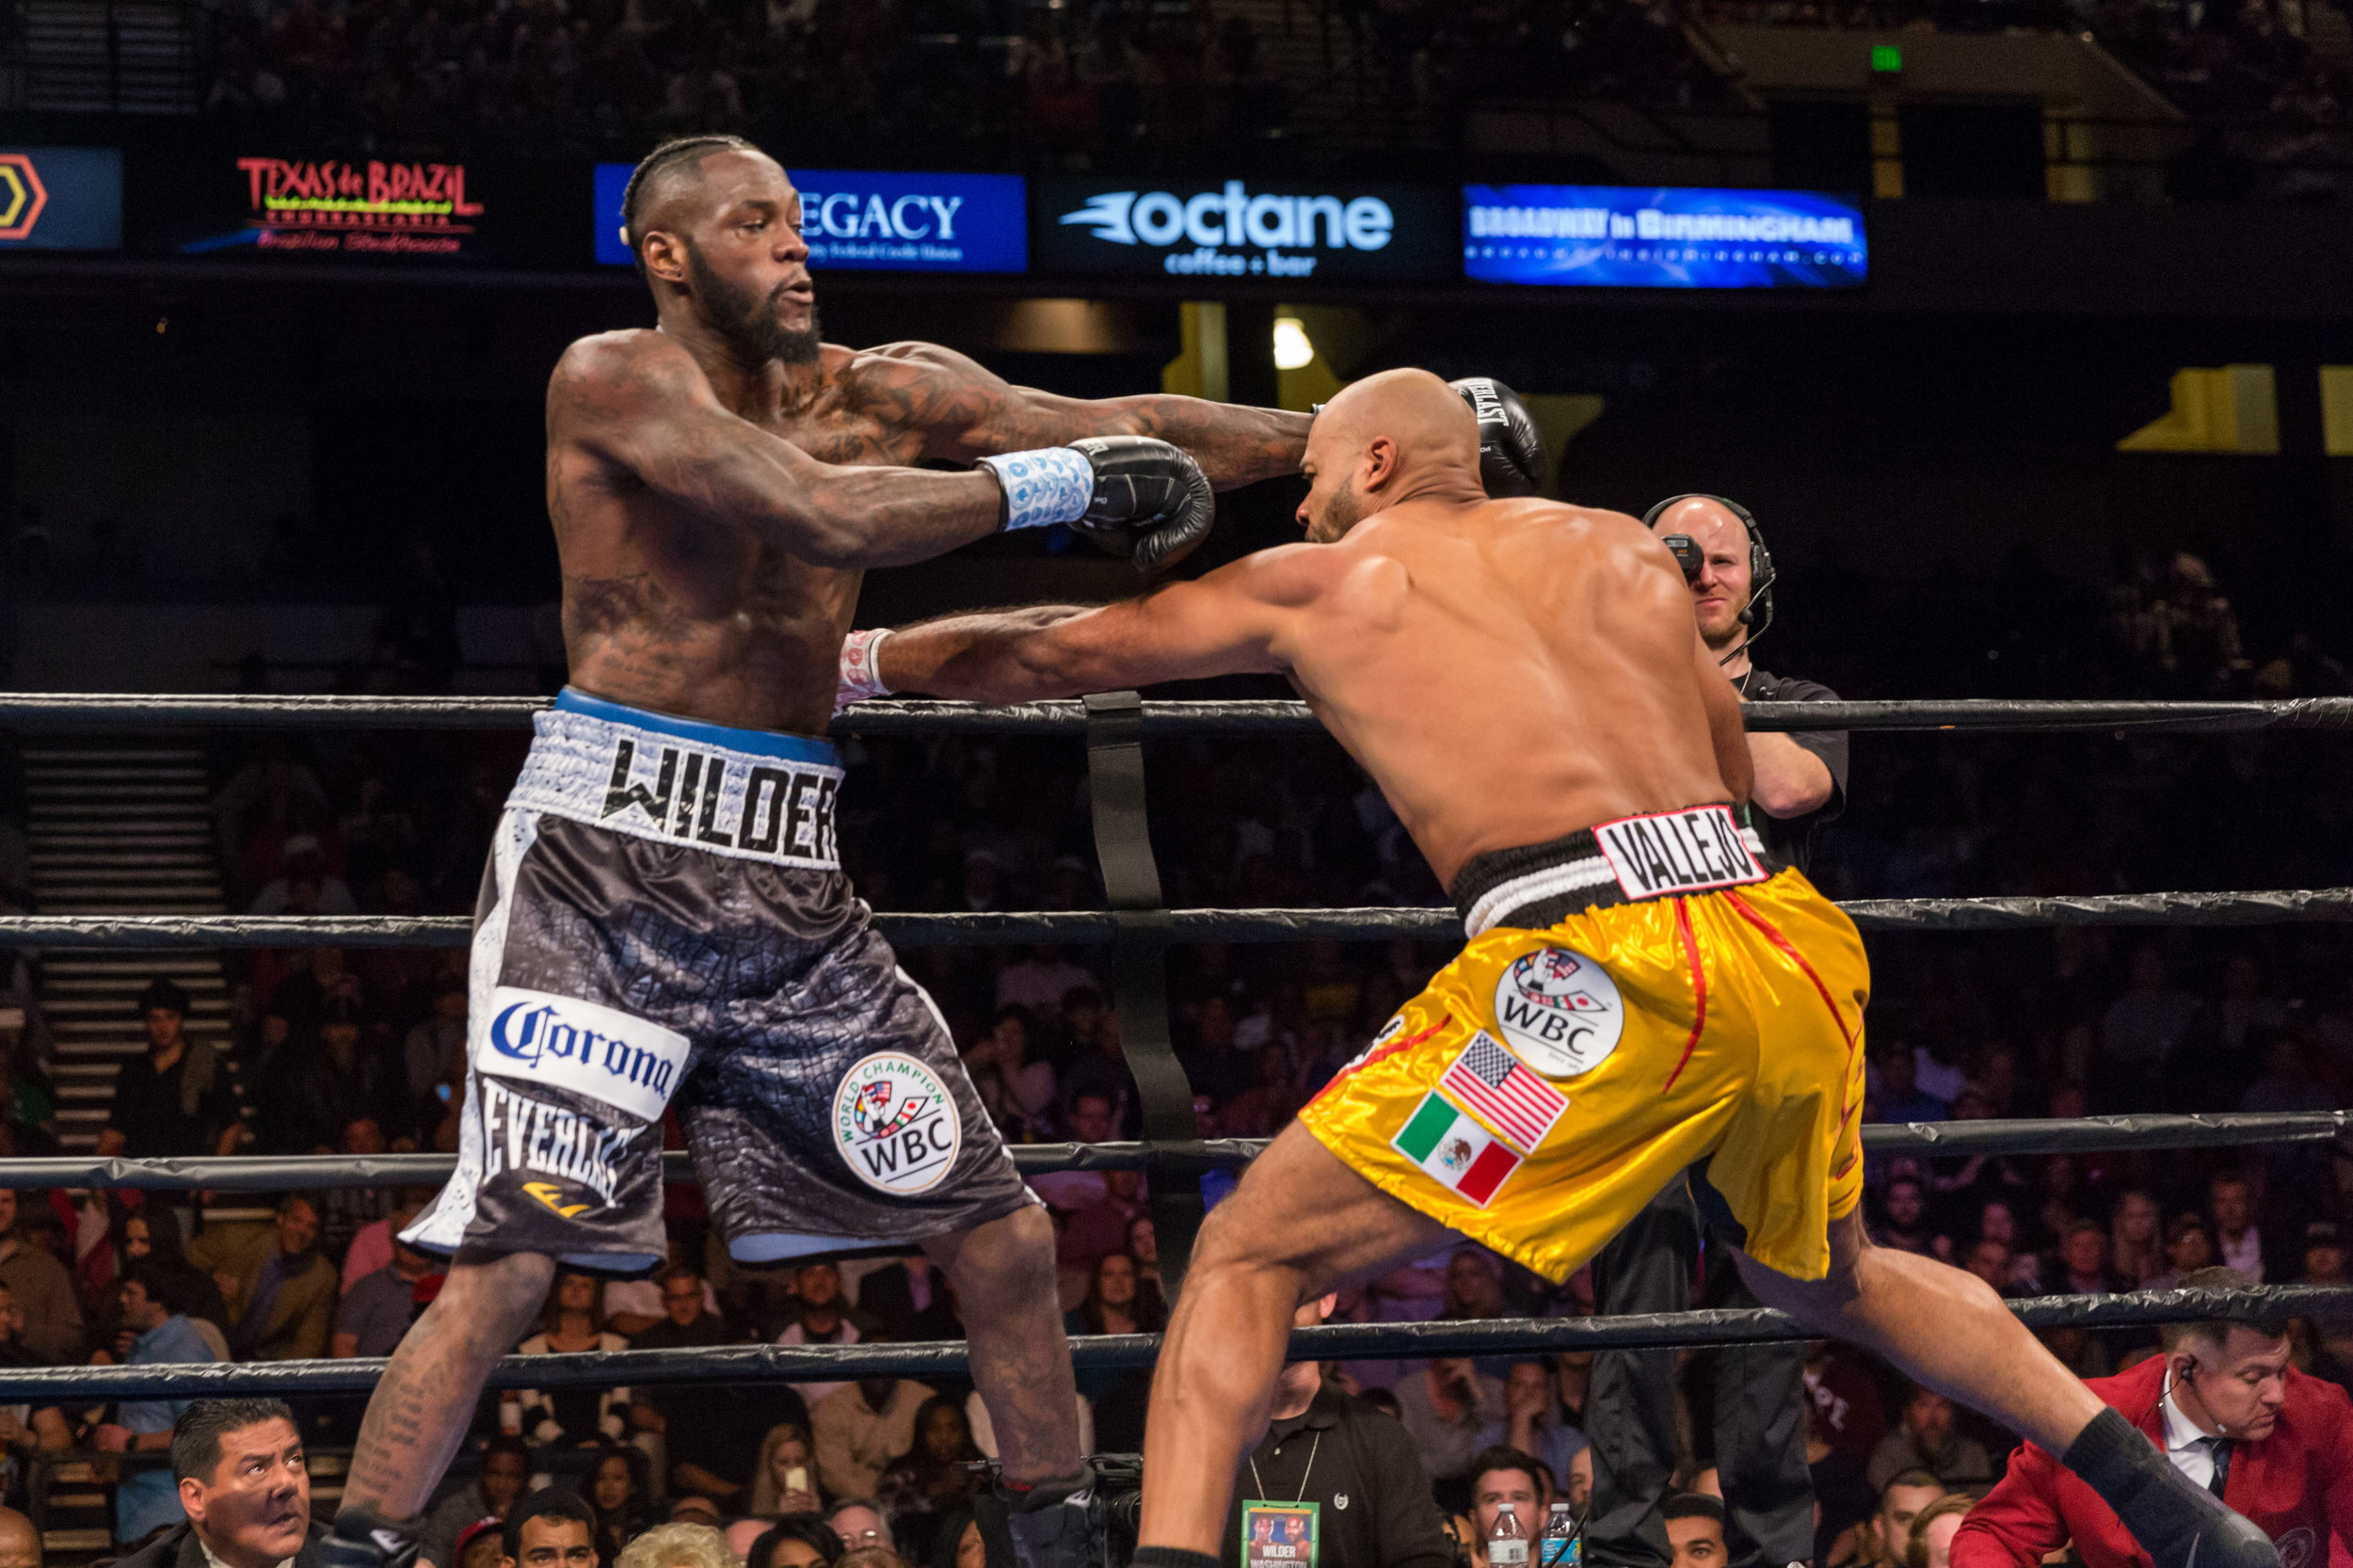 Deontay Wilder vs Gerald Washington - February 25_ 2017_02_25_2017_Fight_Ryan Hafey _ Premier Boxing Champions4.jpg